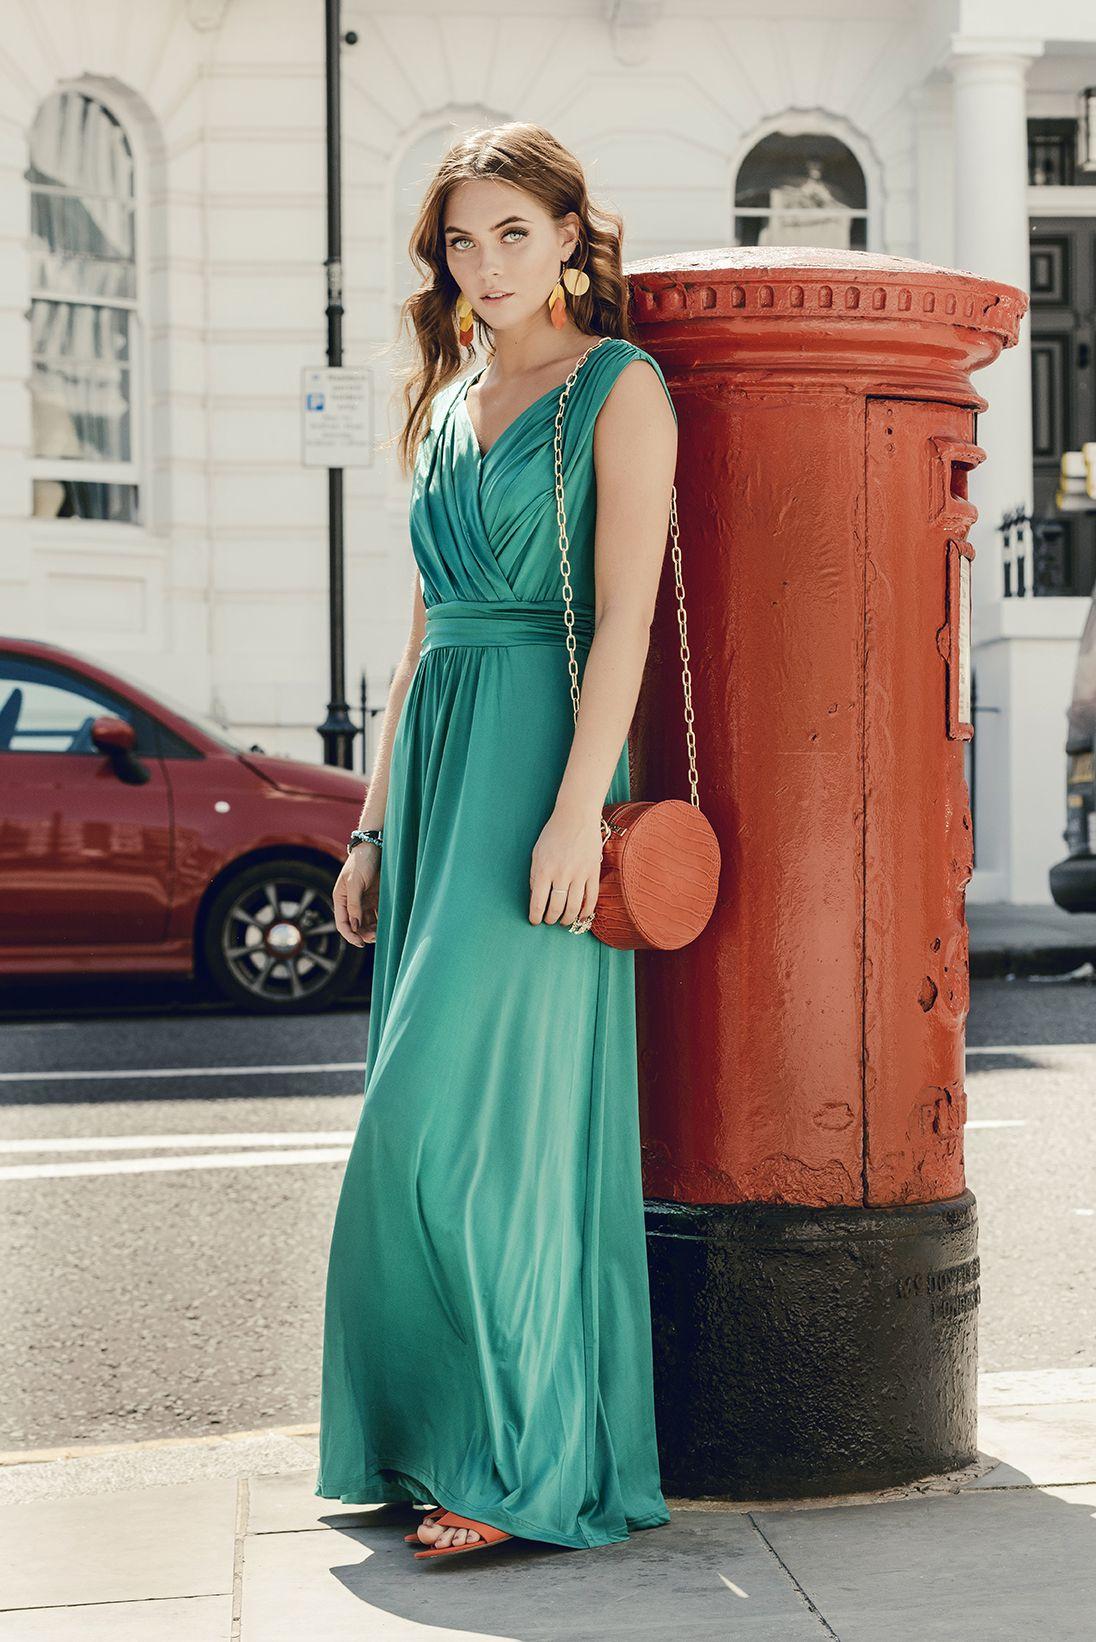 Jolie Moi Jessica Maxi Dress Available In 5 Colours Vintage Style Elegant Dress Green Dress Occasion Dress Plunge Wrap Dress Wrap Dress Dresses [ 1642 x 1096 Pixel ]